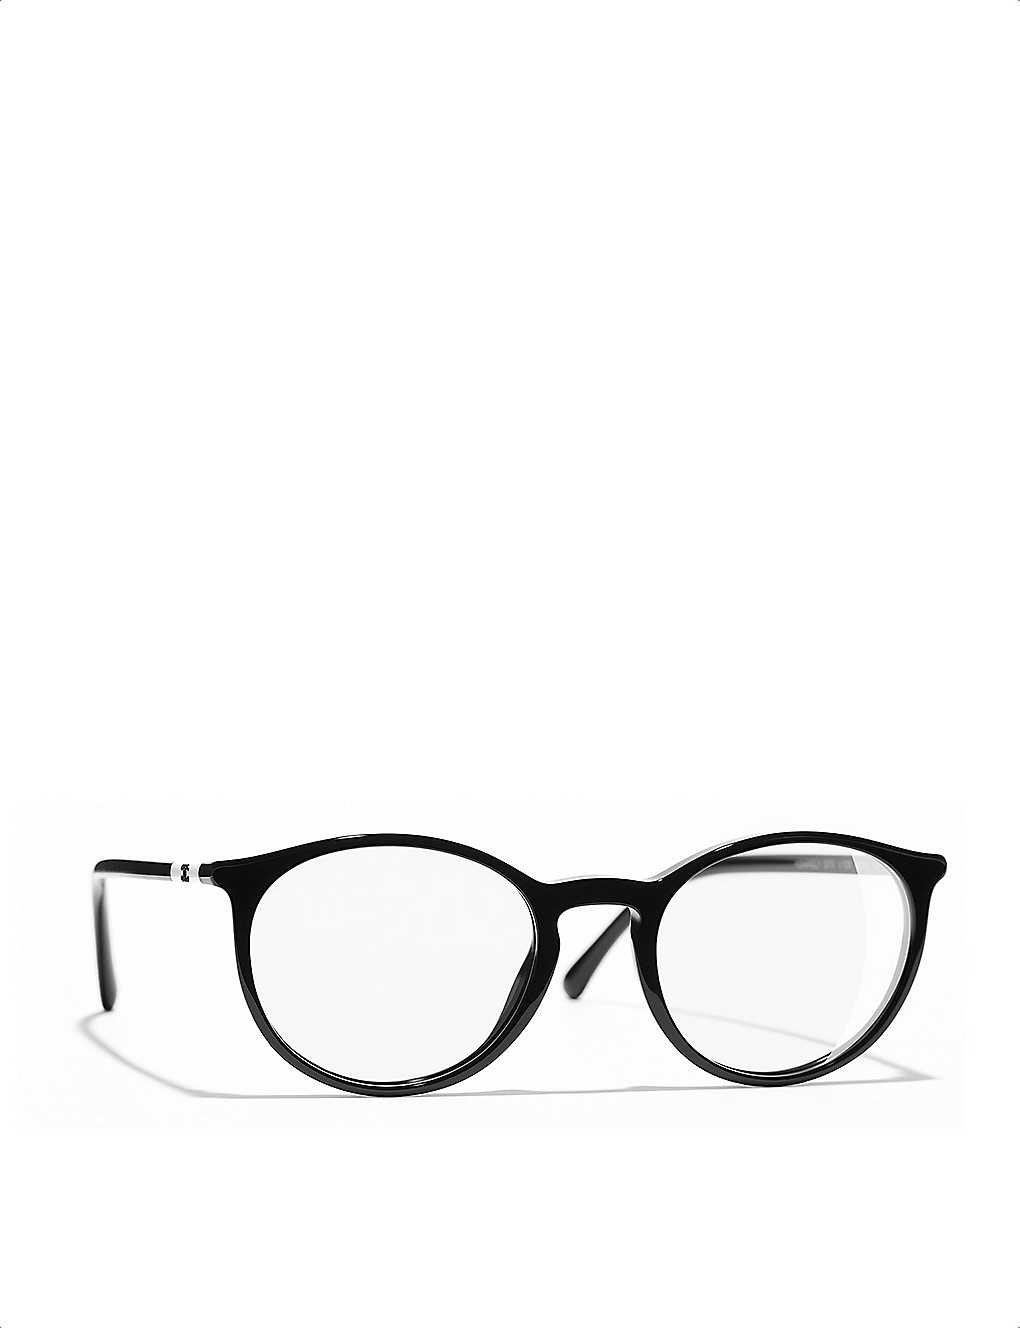 023d5b85db416 CHANEL - Pantos 3372 round-frame glasses